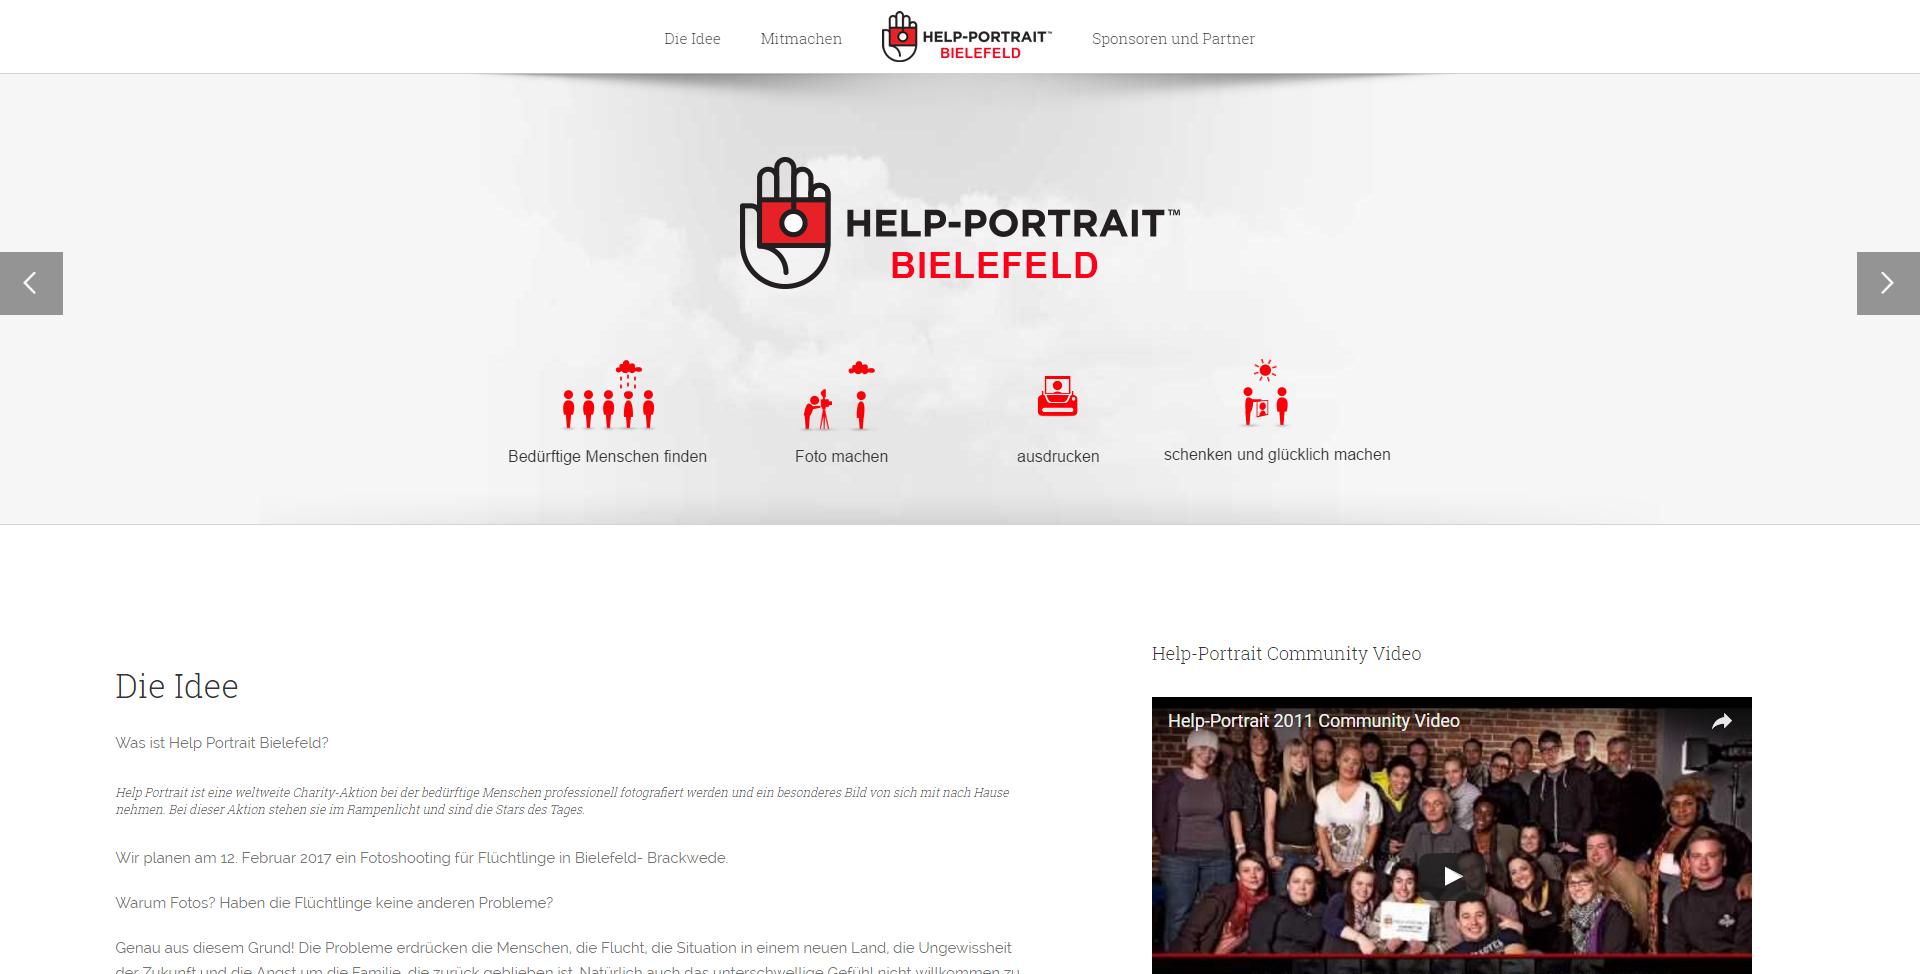 Help-Portrait Bielefeld